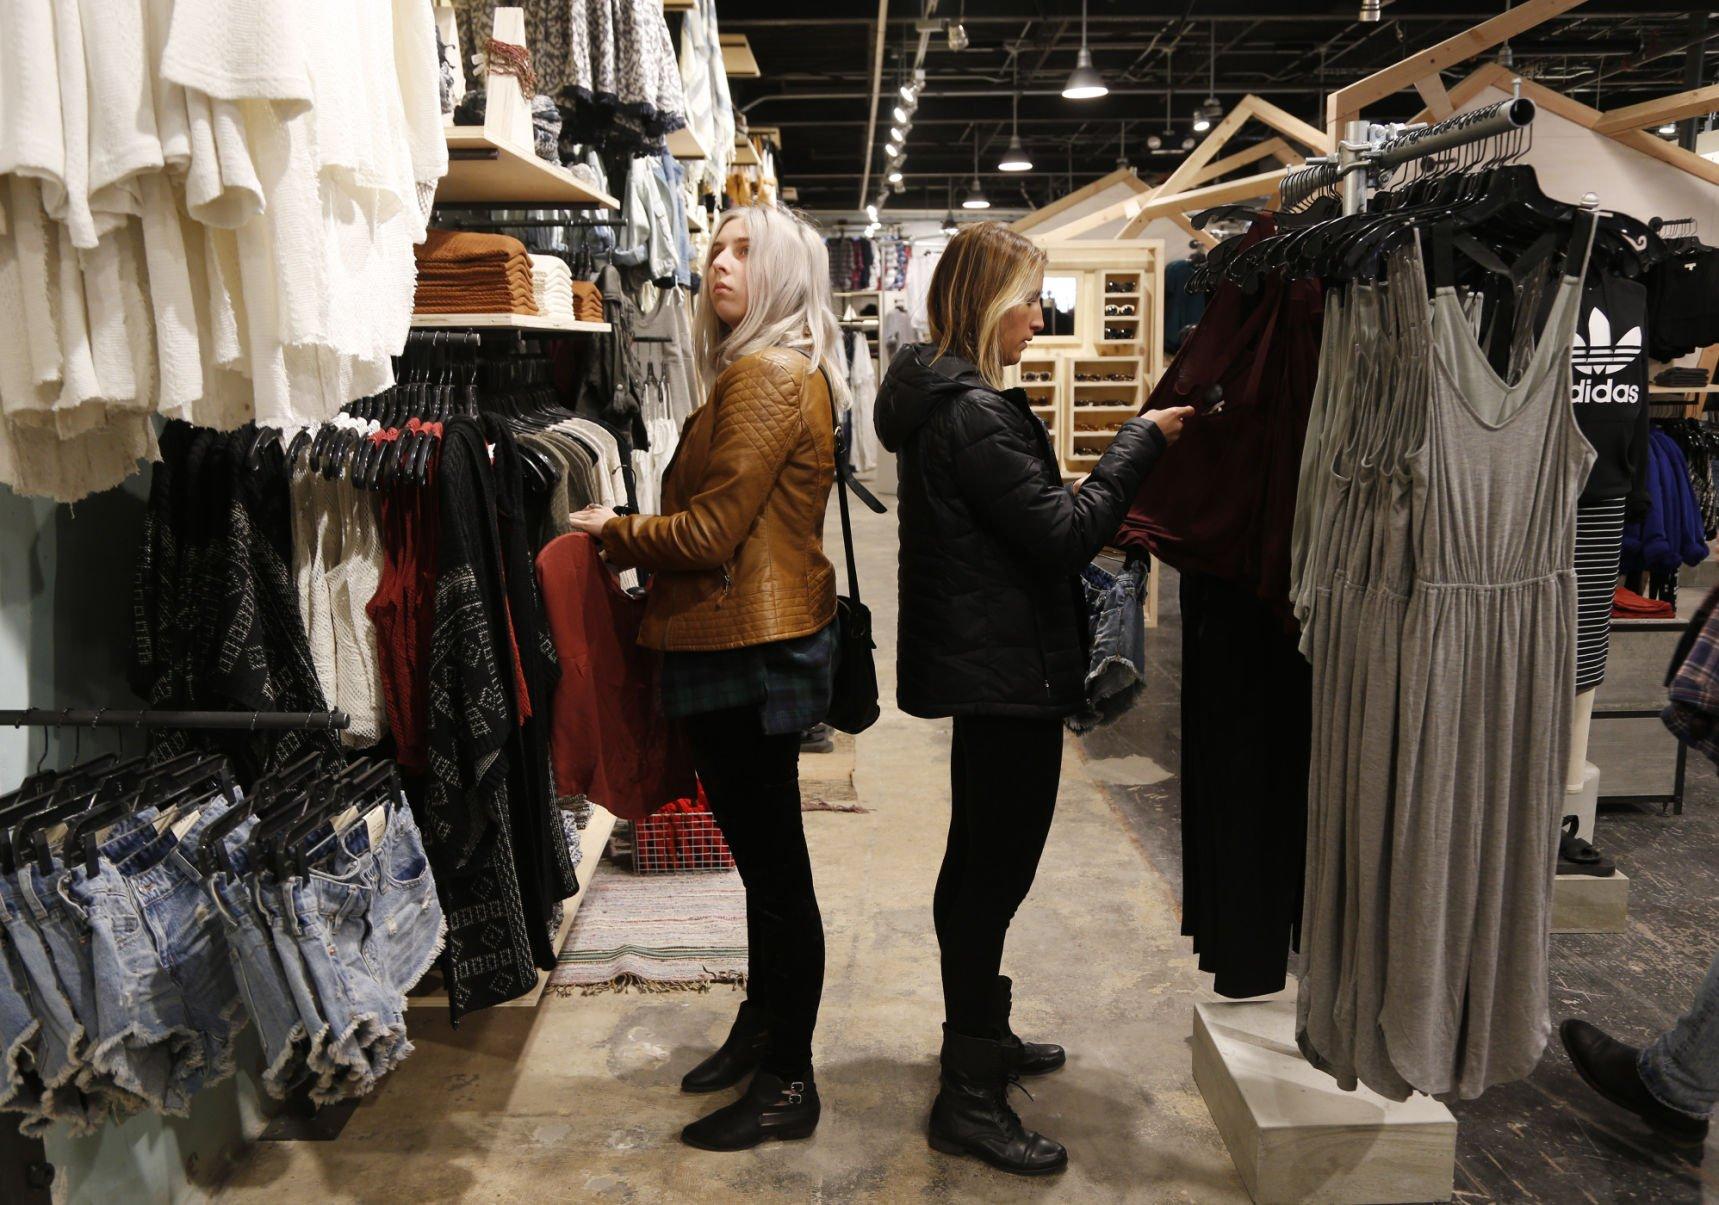 Tulsa clothing stores